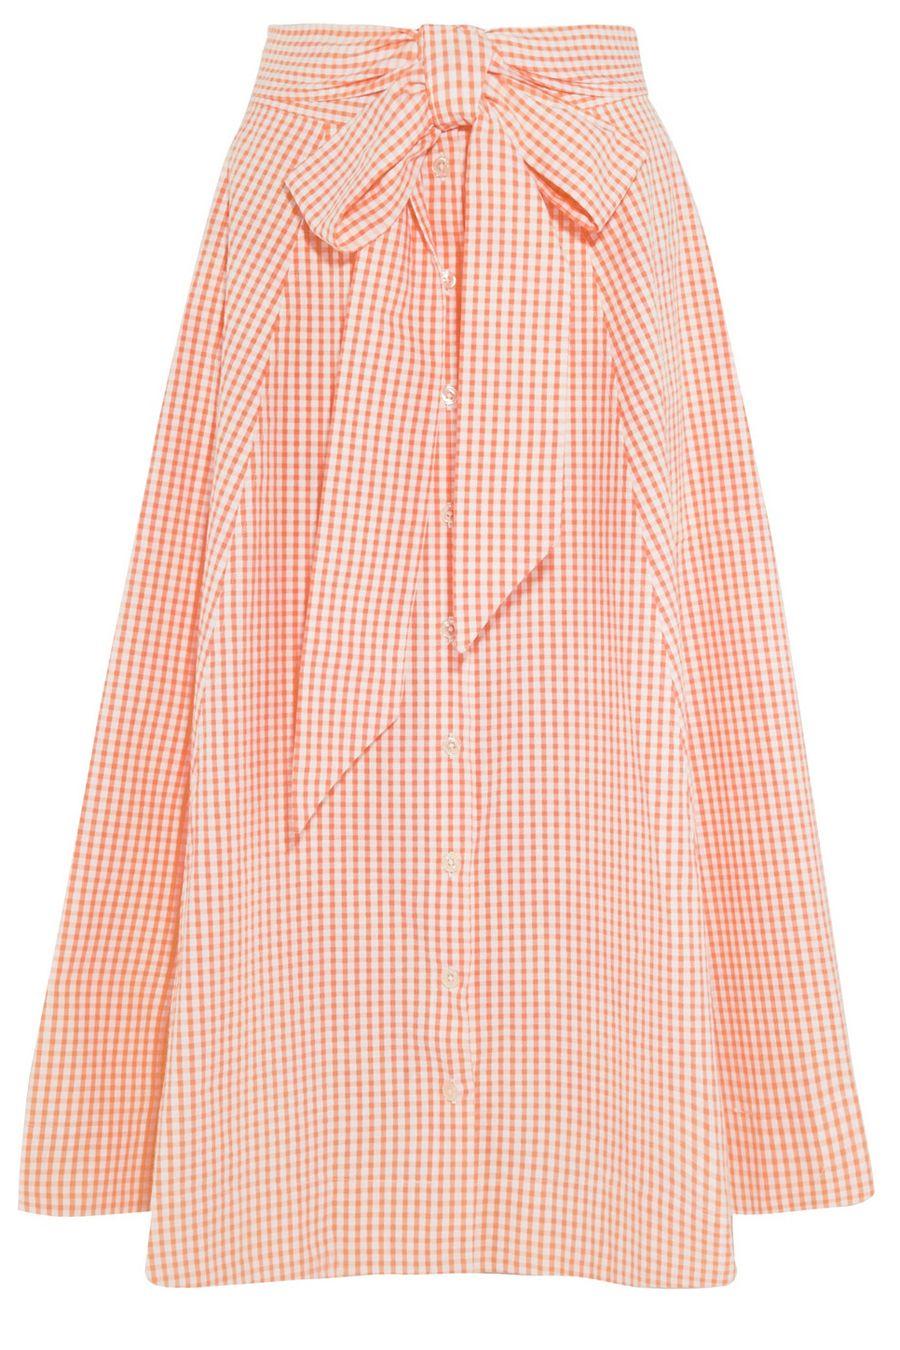 "<p><strong>Lisa Marie Fernandez</strong> skirt, $465, <a href=""https://www.net-a-porter.com/us/en/product/692070/lisa_marie_fernandez/pleated-gingham-cotton-midi-skirt"" target=""_blank"">netaporter.com</a>. </p>"